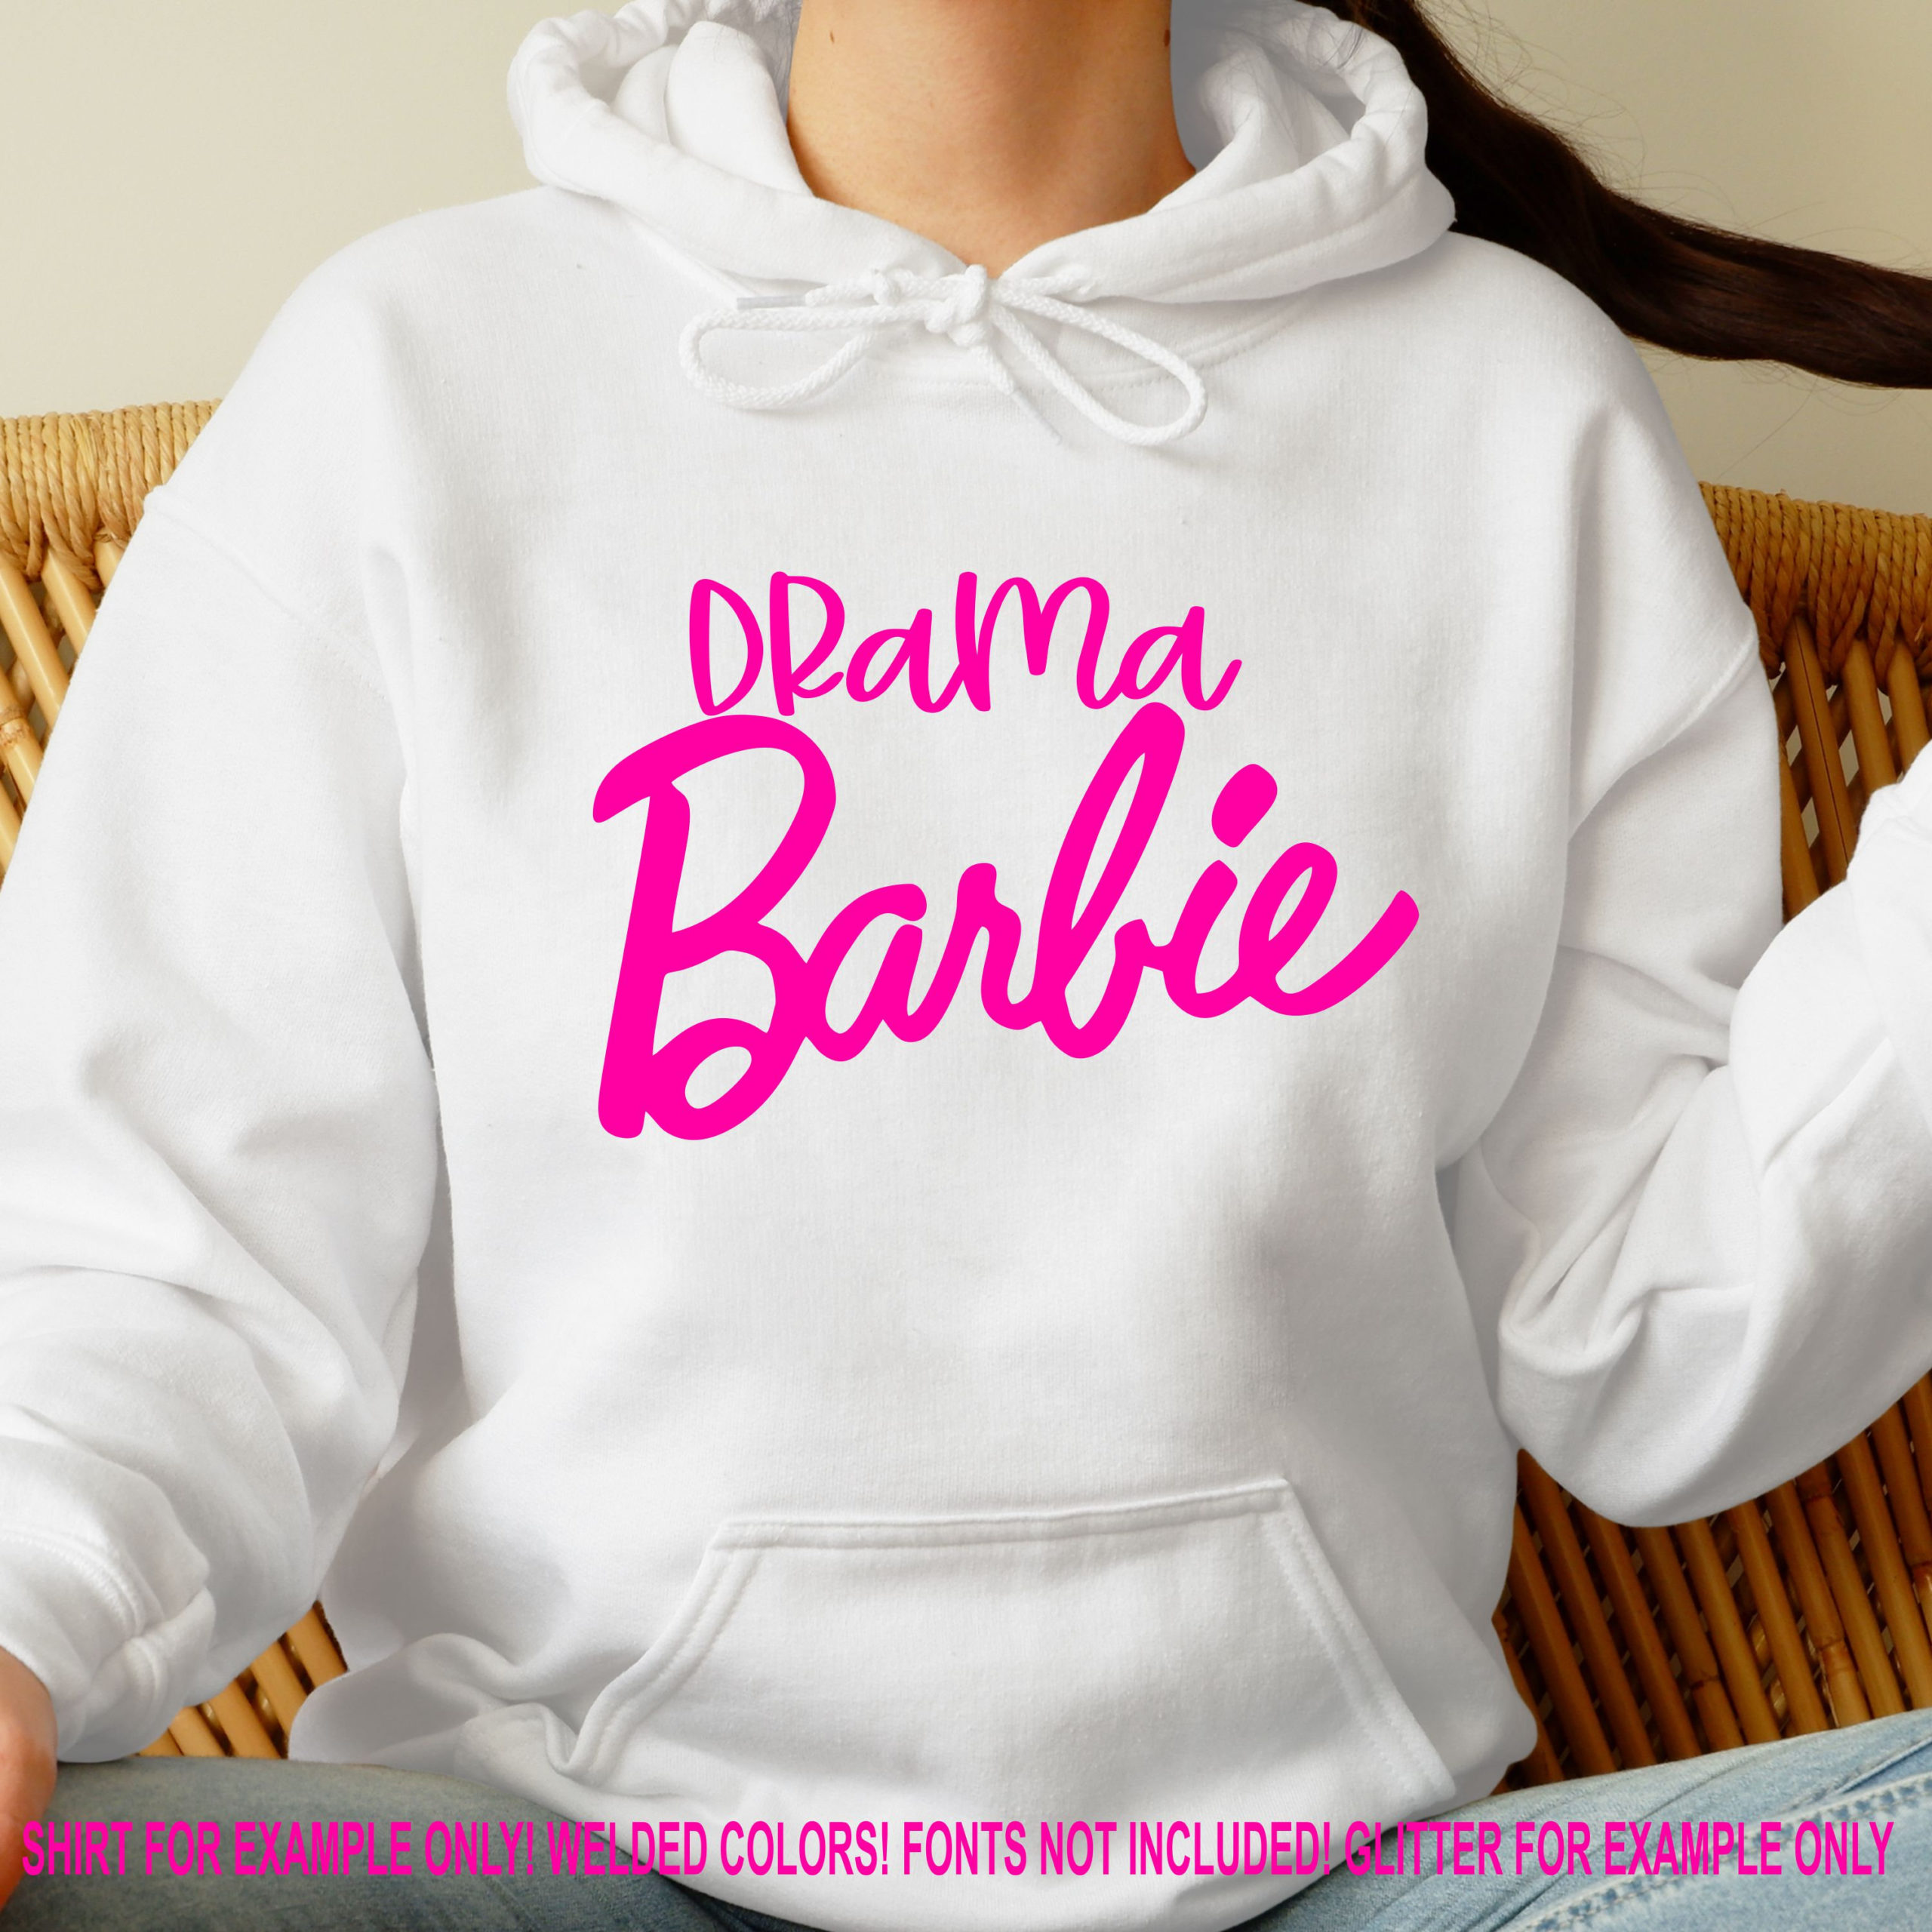 Drama-barbie-svg-barbie-drama-svg-barbie-doll-svg-girlie-svg-birthday-svg-design-birthday-cut-file-cricut-svg-cut-files-svg-files-605130e5